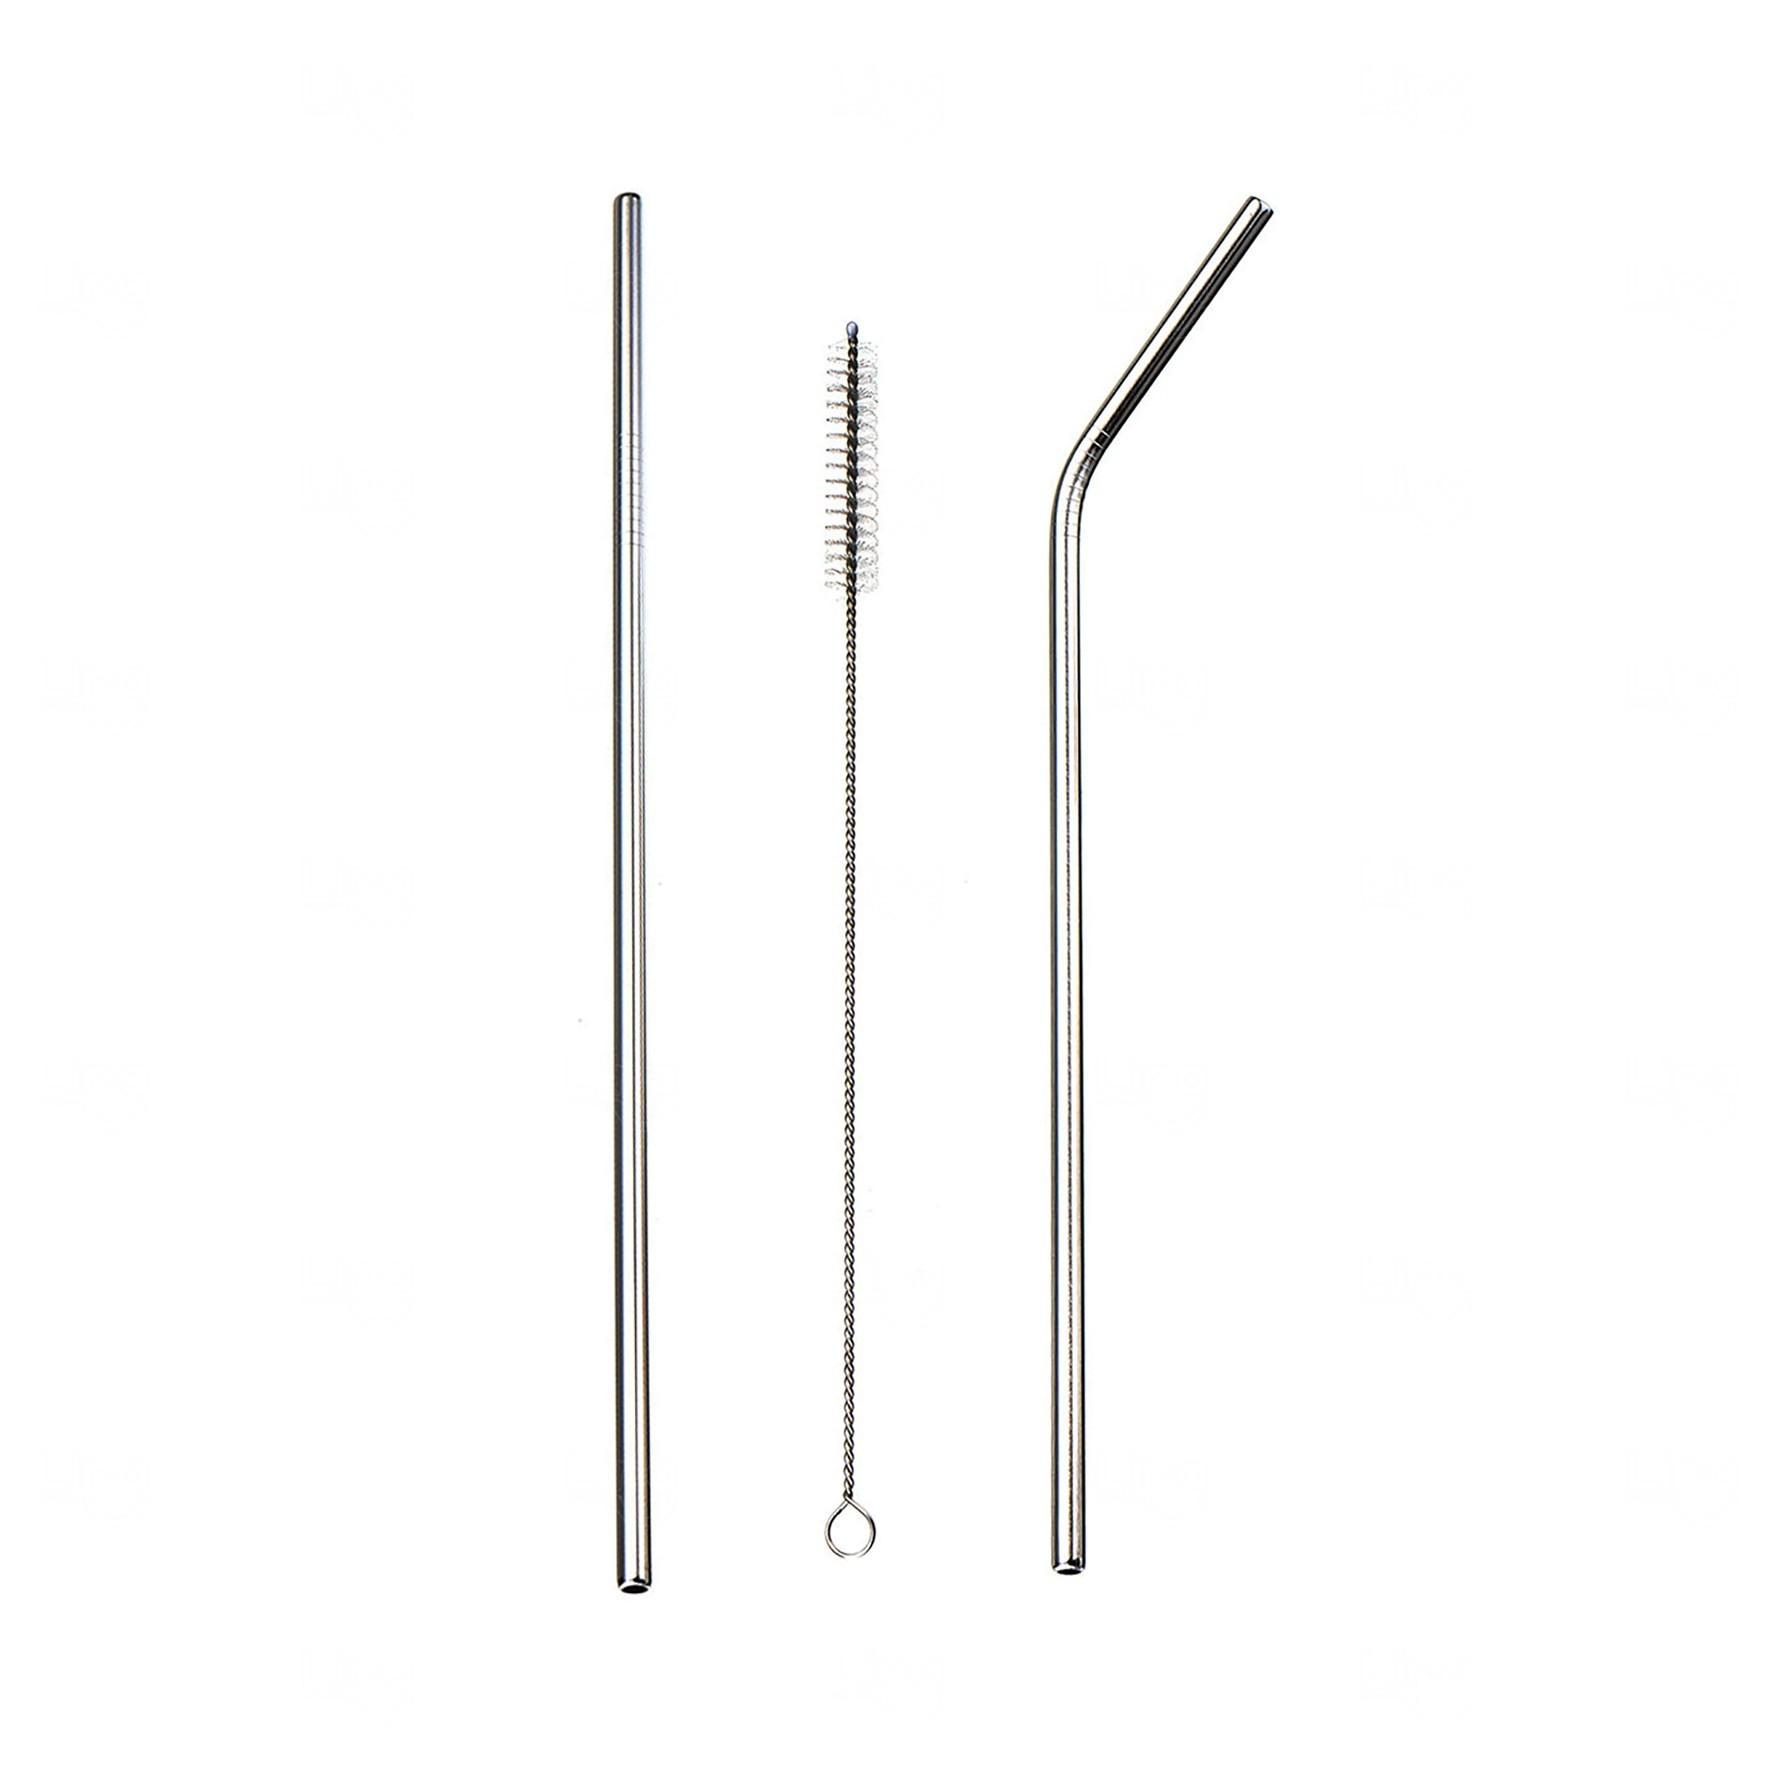 Kit Canudo de Metal Personalizado Inox